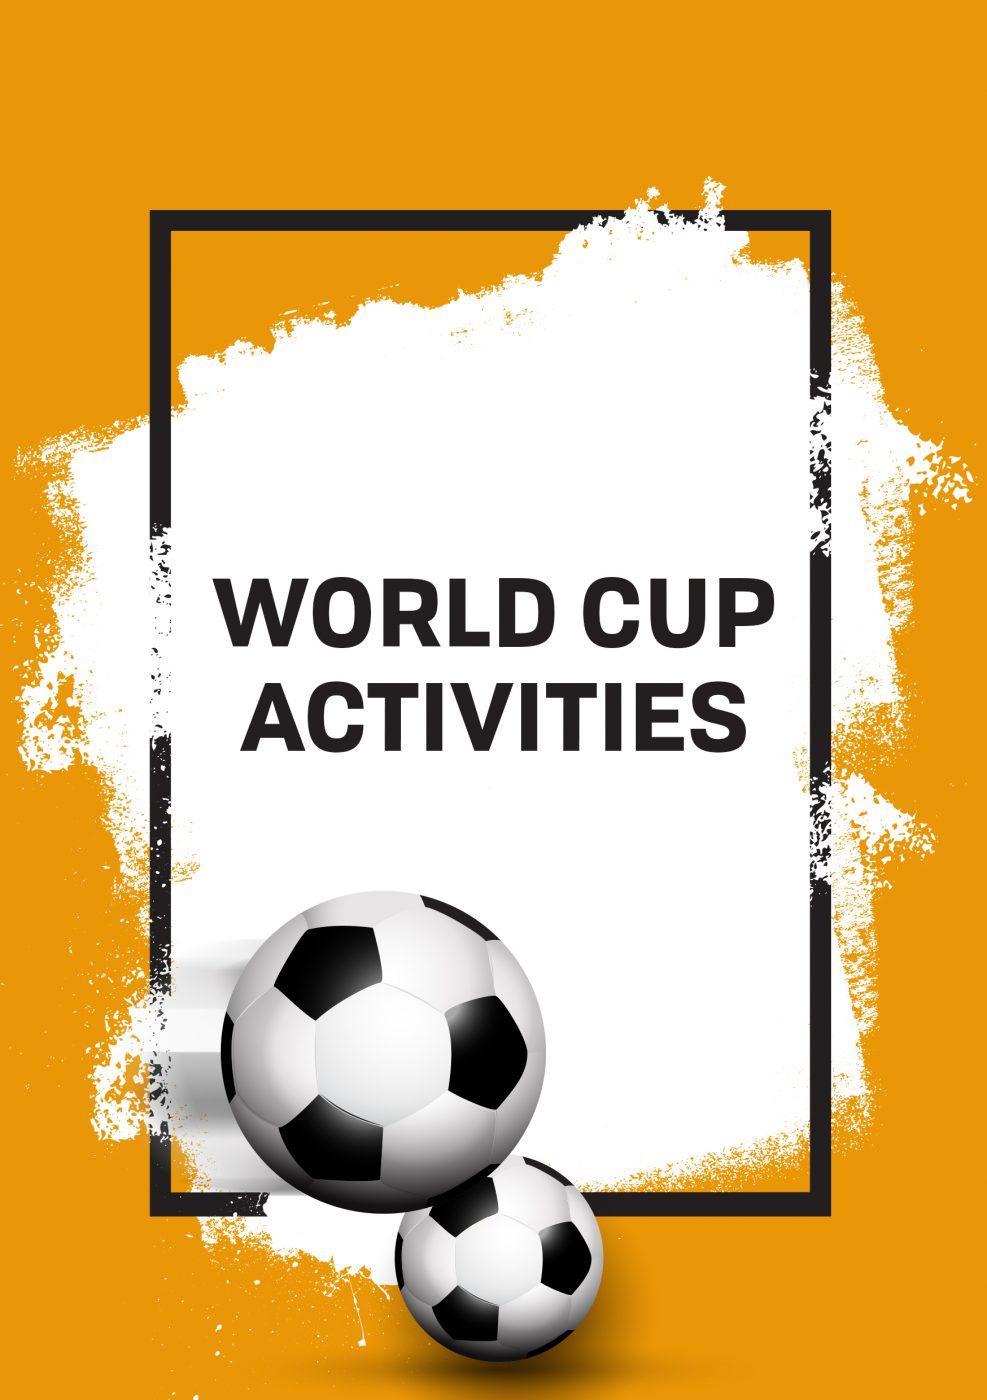 WORLD CUP ACTIVITIES